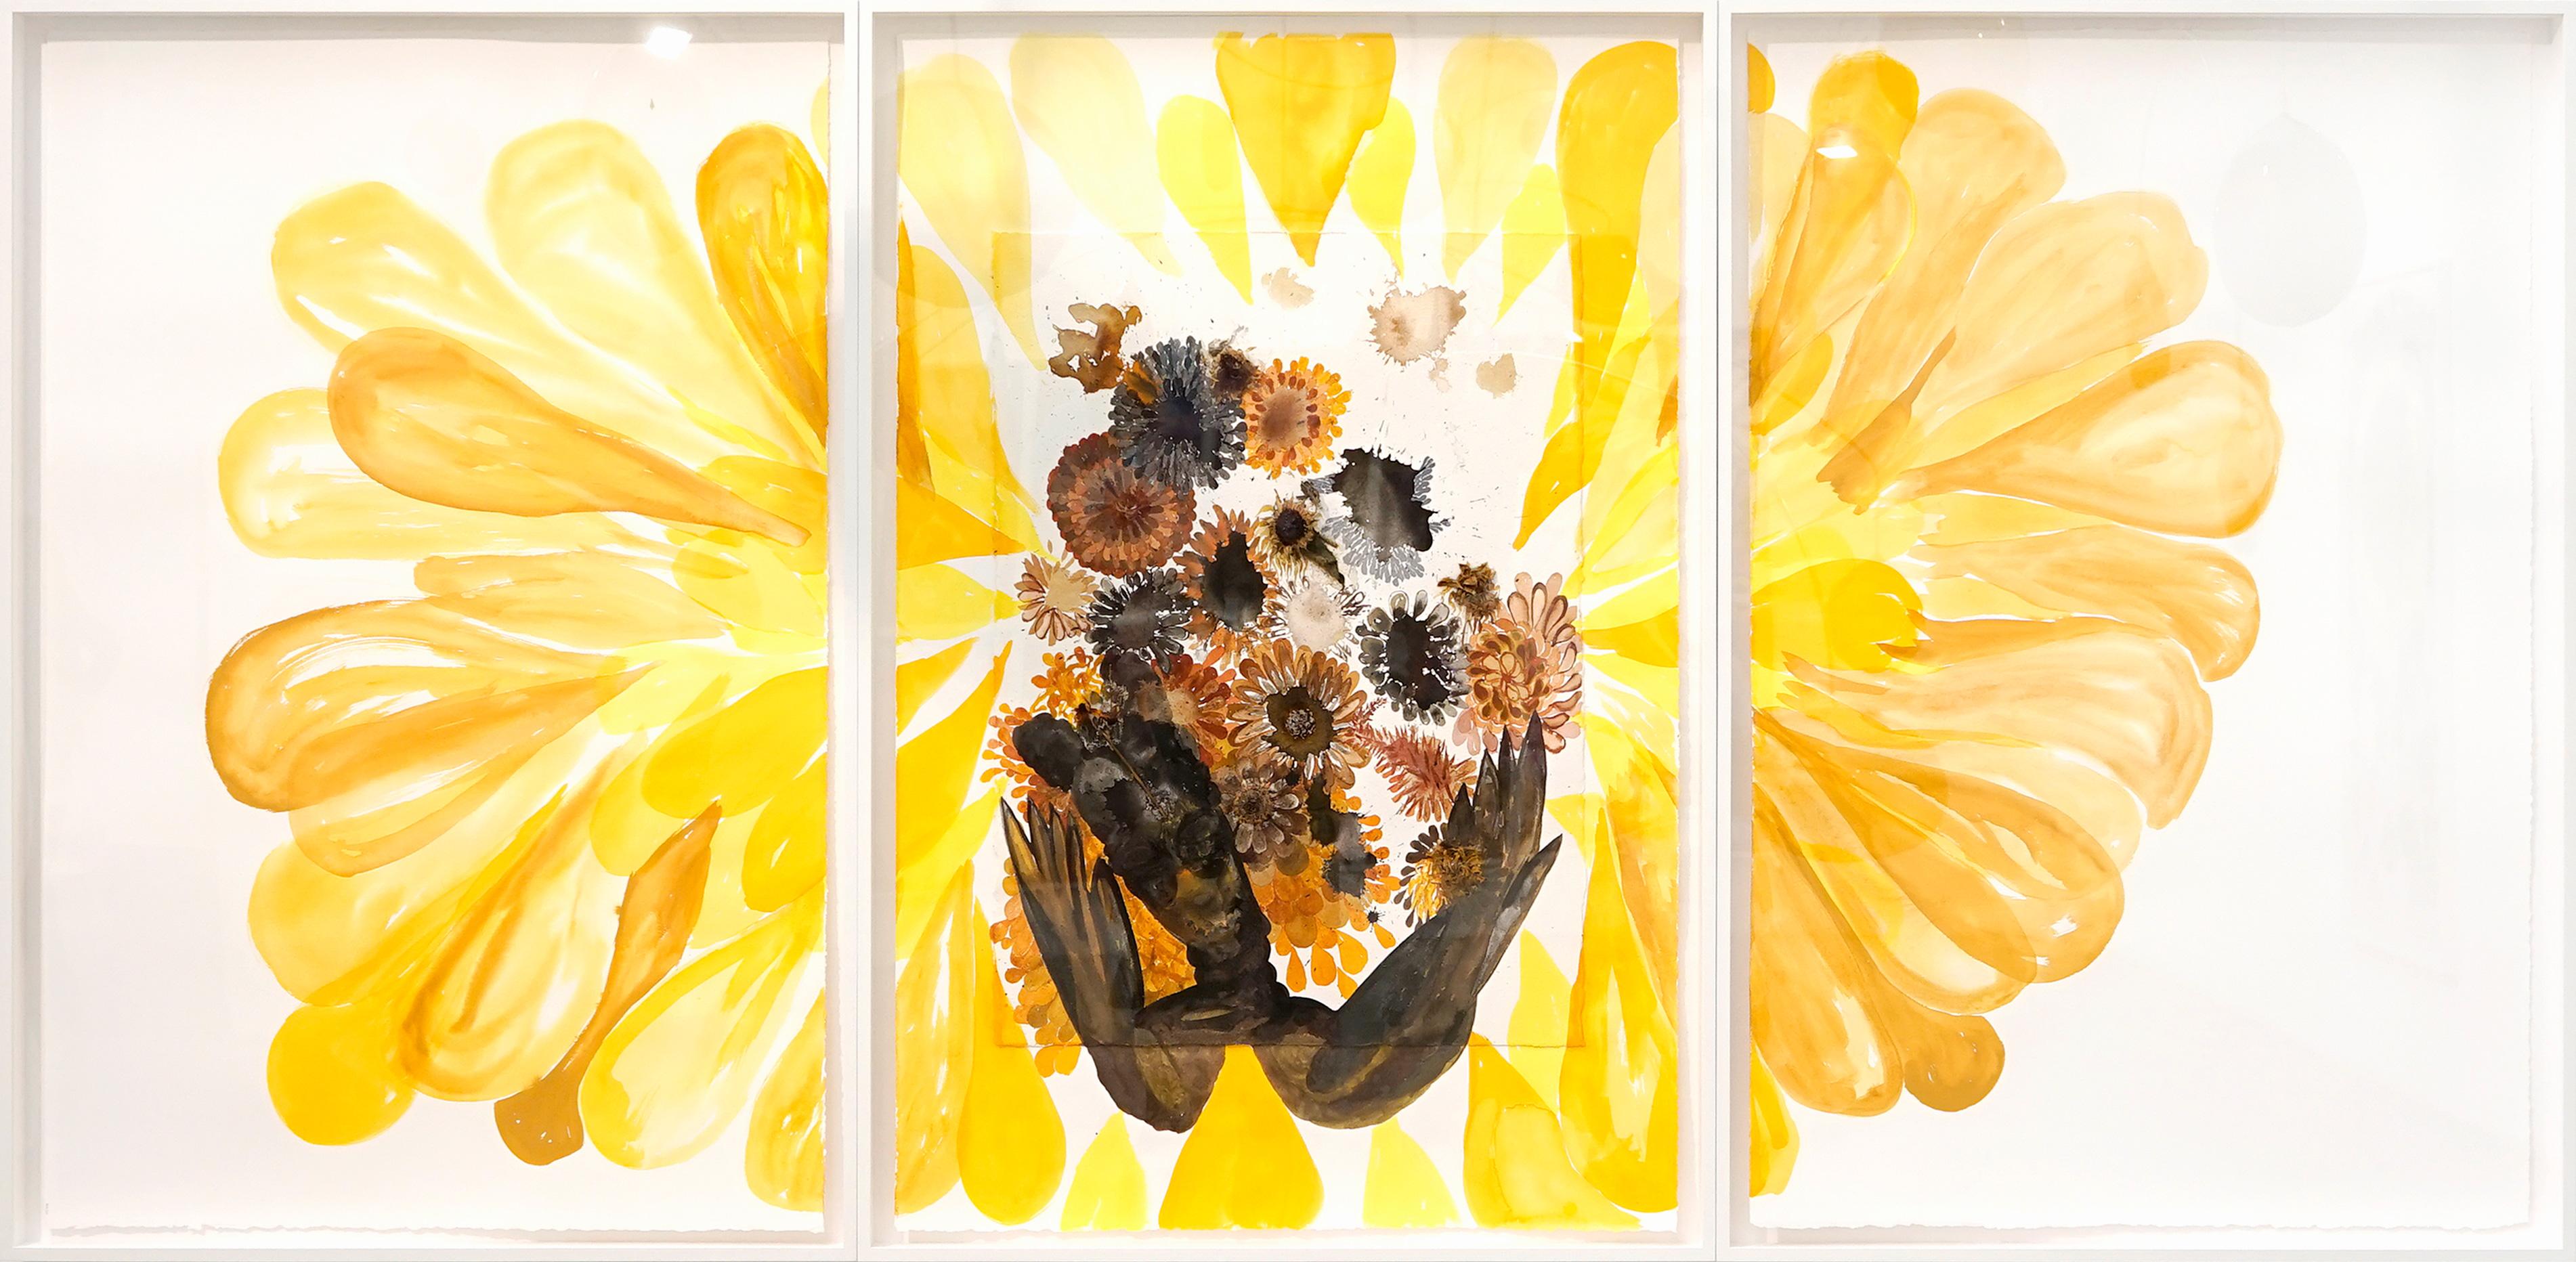 Galerie Barbara Thumm \ María Magdalena Campos-Pons – Untitled, 2021, MCP-21-012 \ Untitled, (2021)